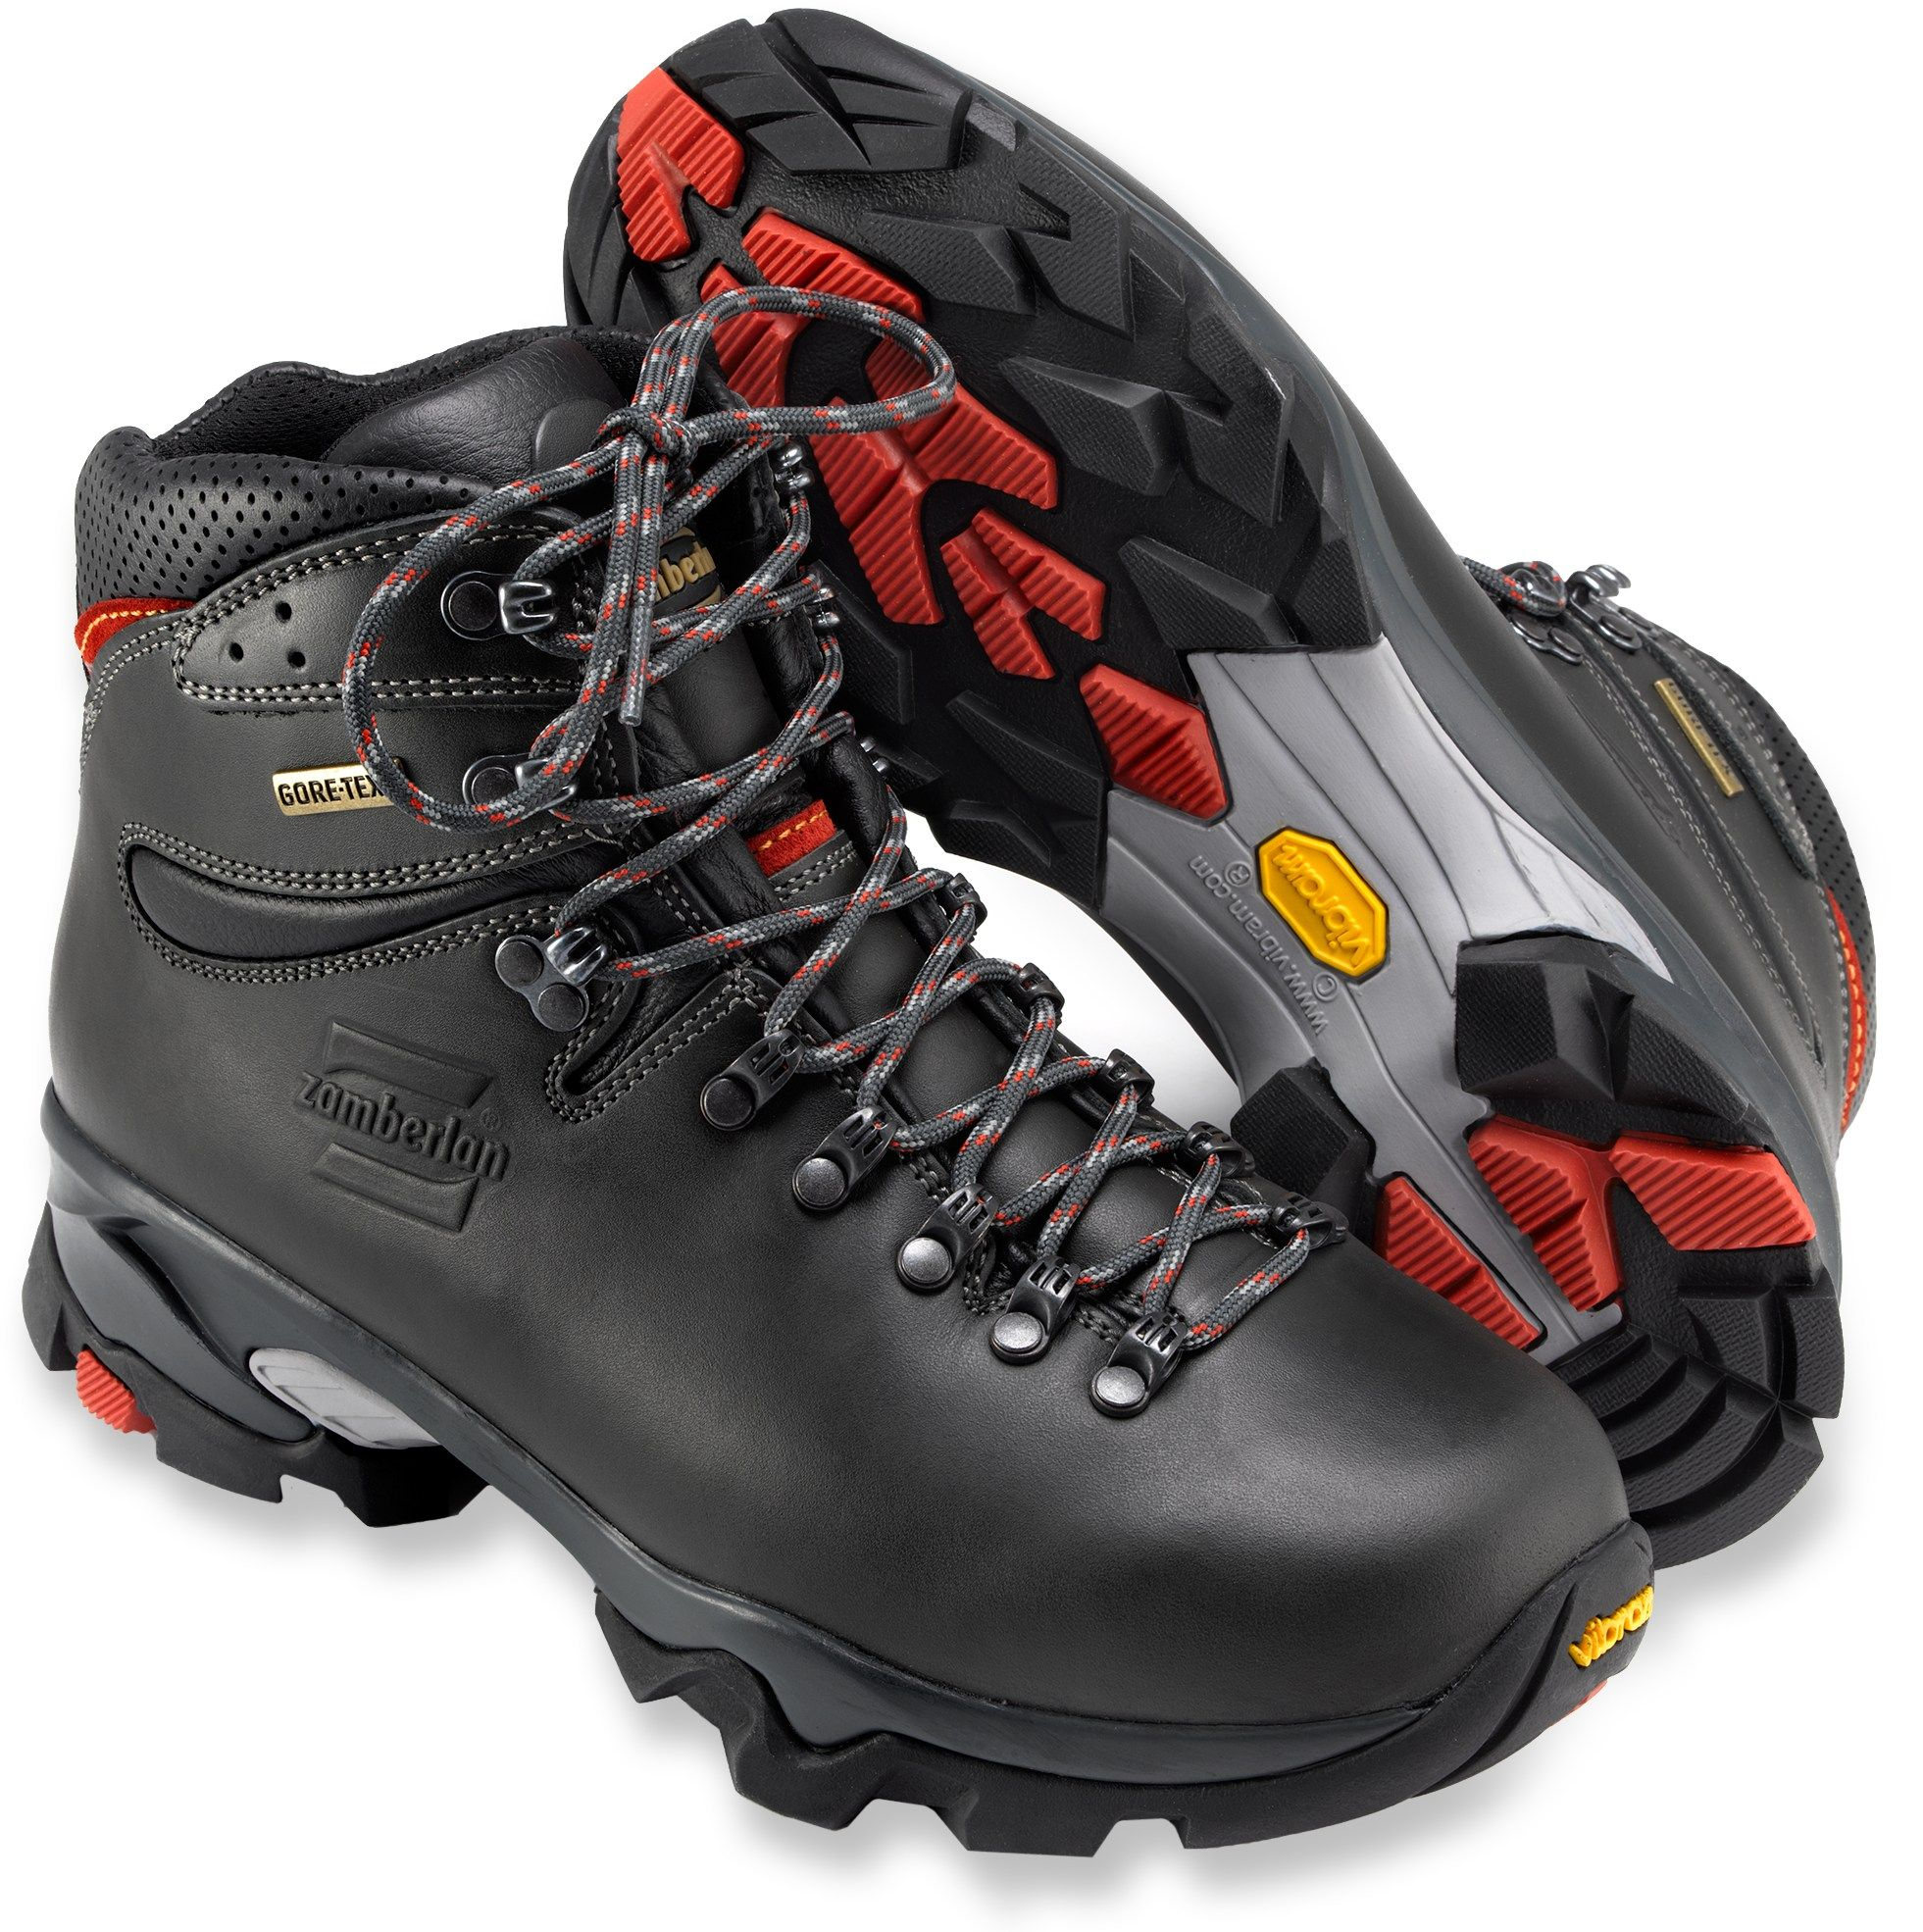 69a8a14ae8e Zamberlan Men's Vioz GT Hiking Boots Dark Gray/Red 14 | Backpacking ...